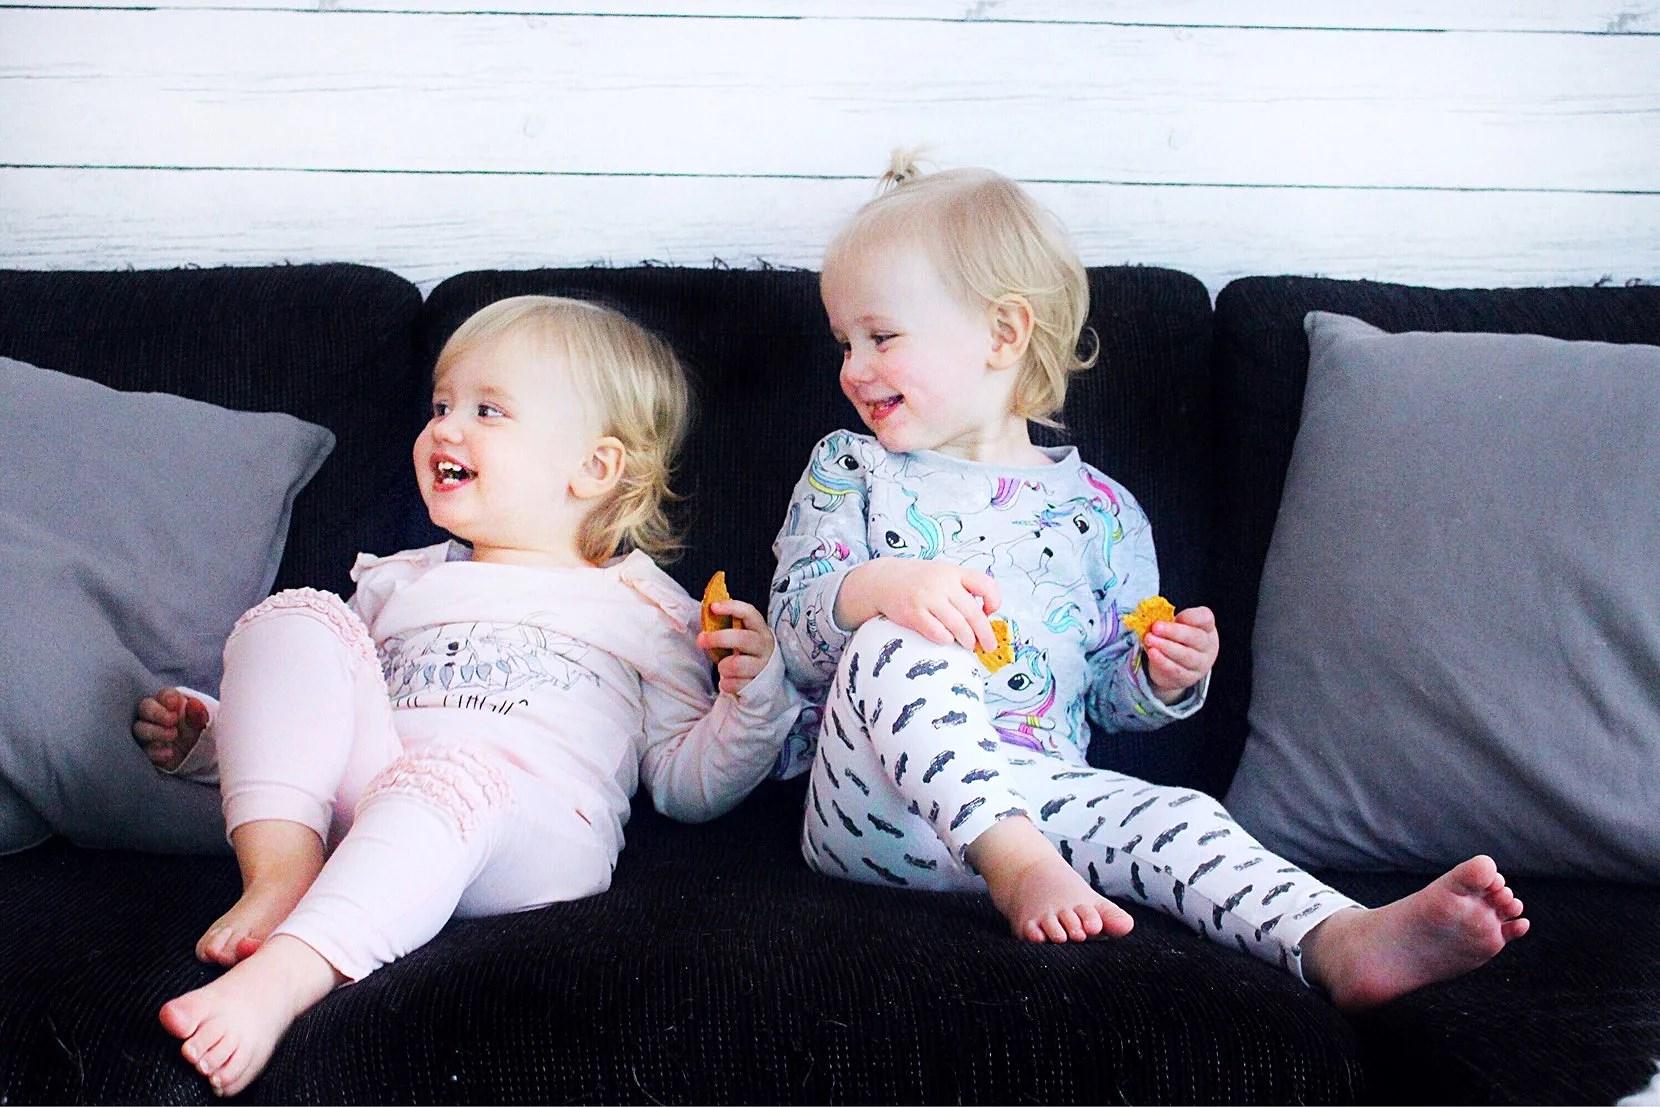 Playdate and momdate!